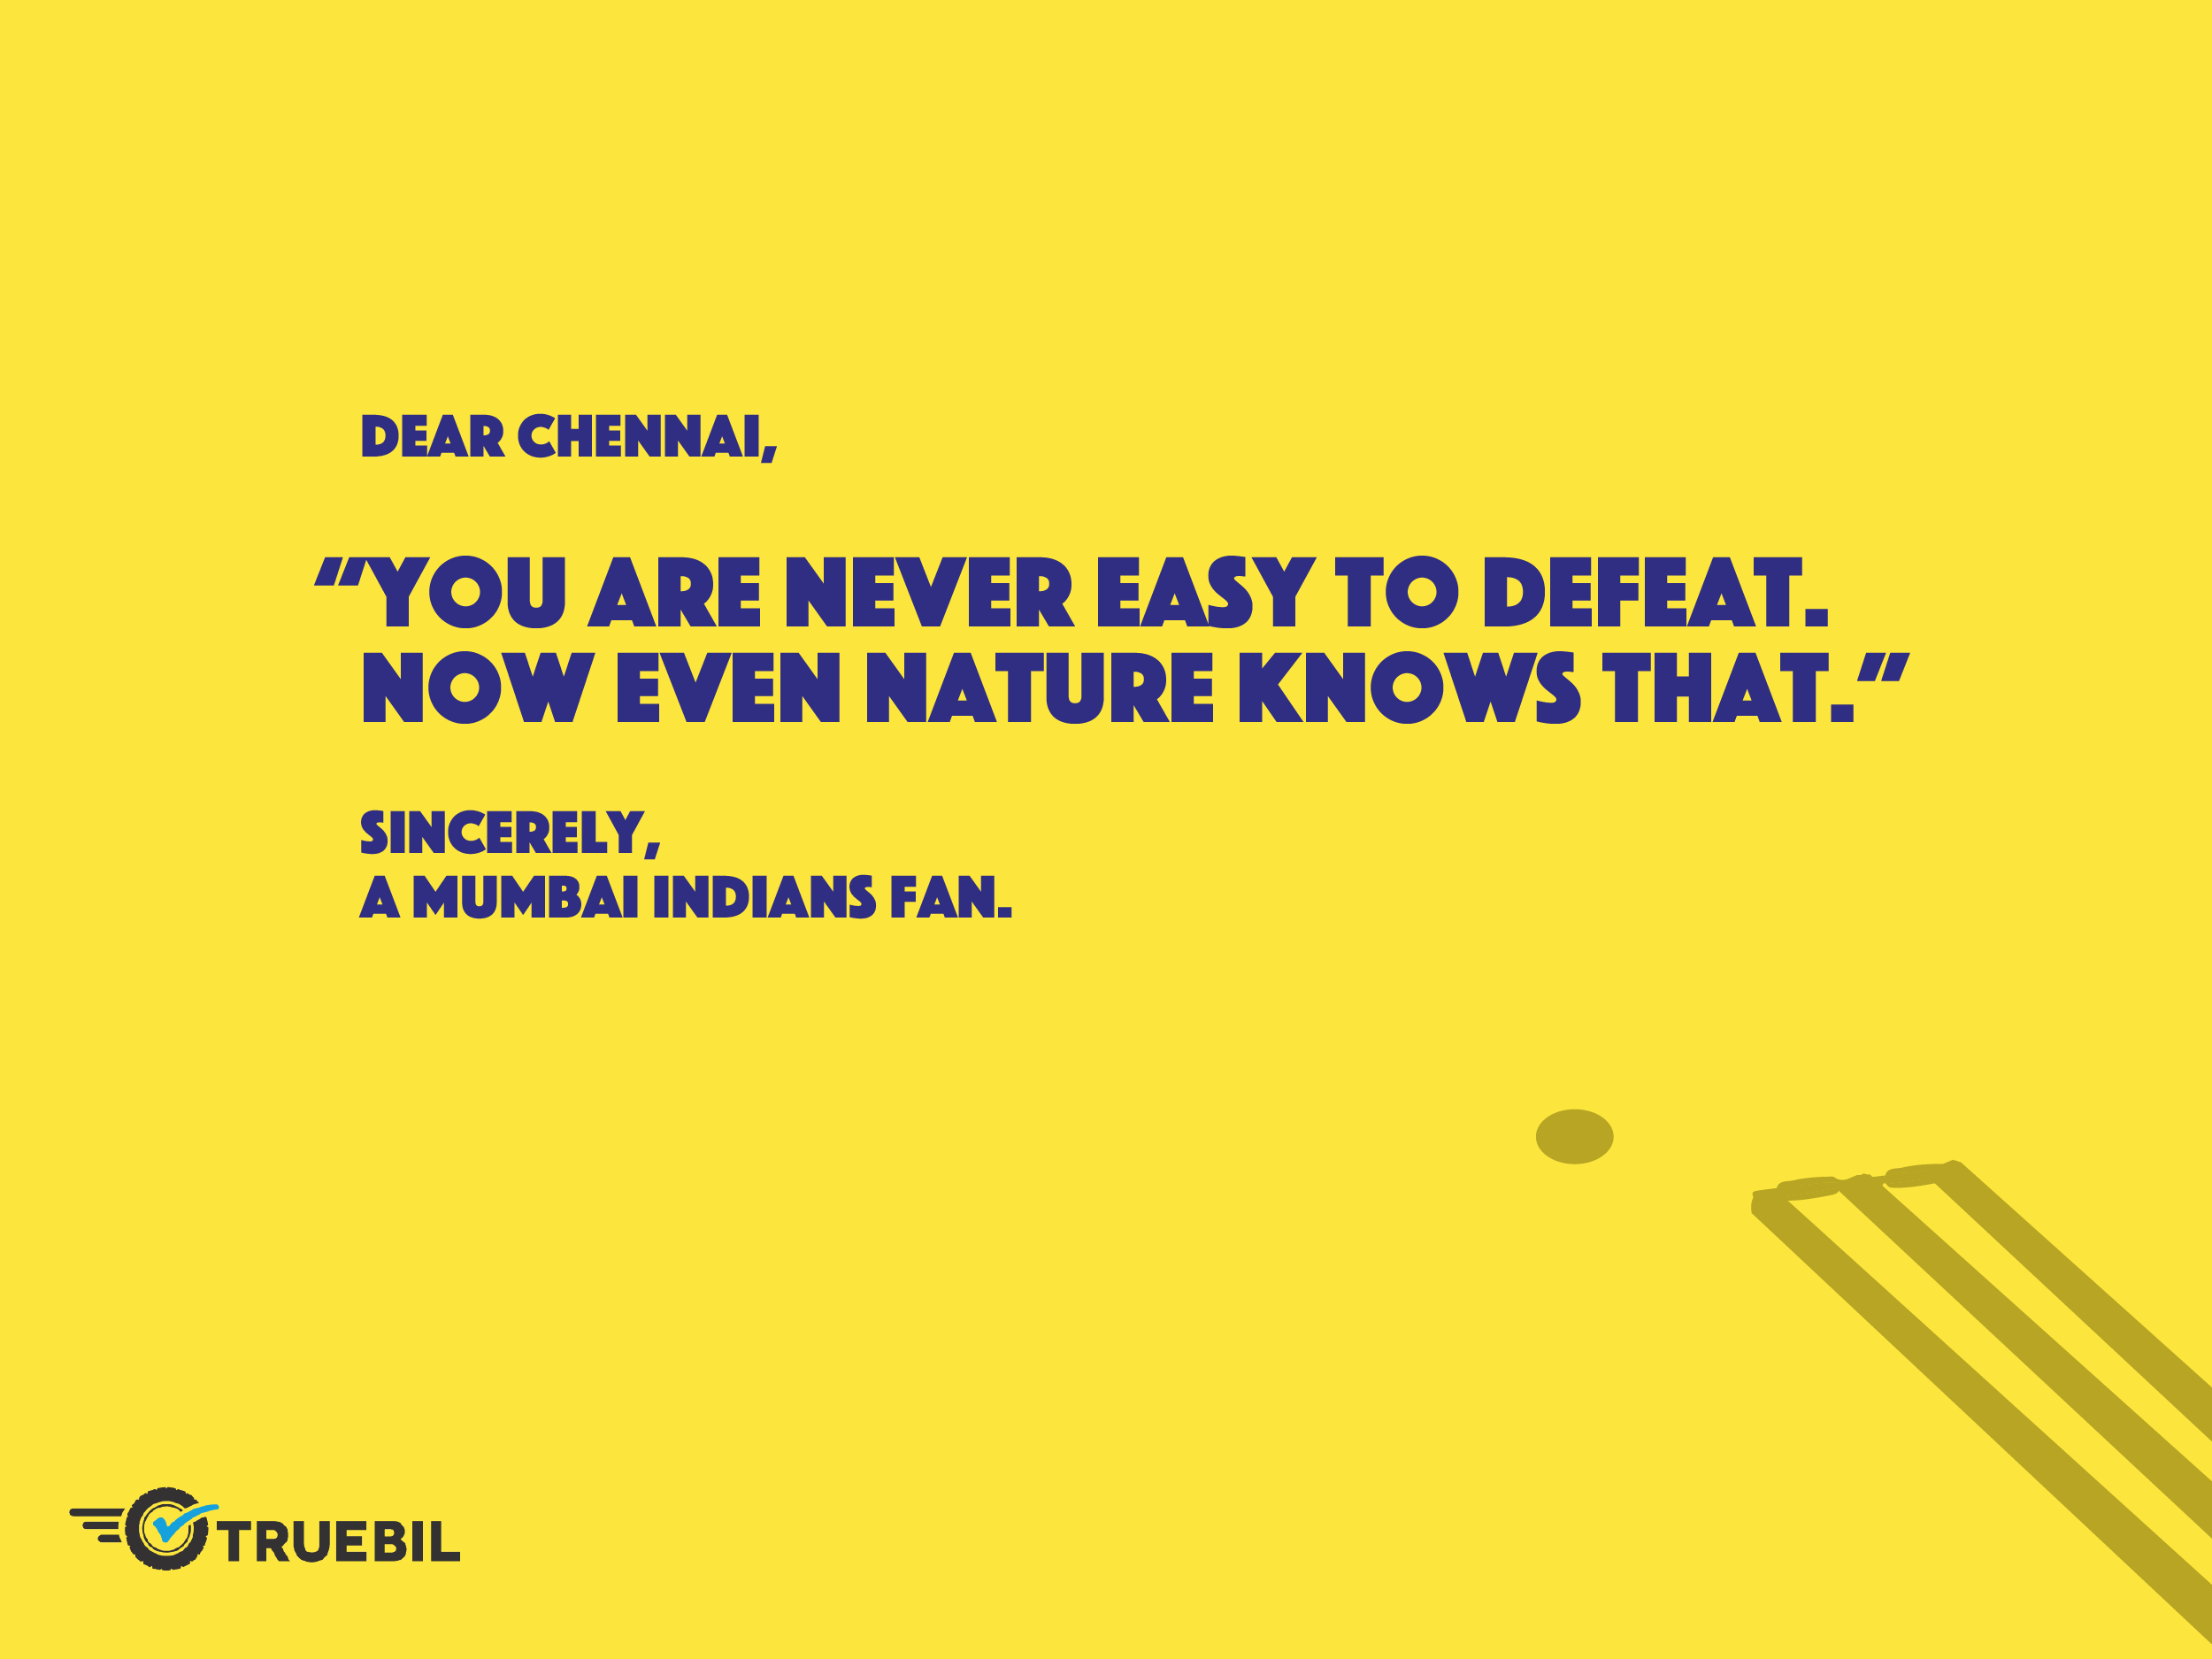 Trubil_chennai post-05